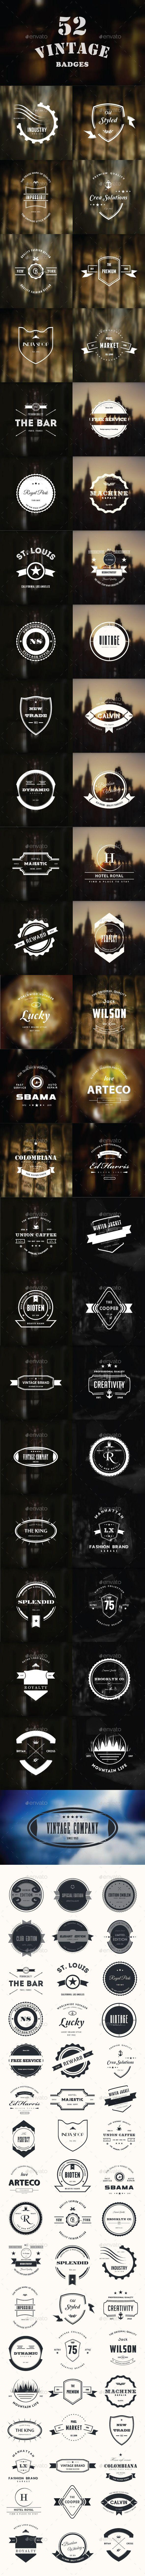 52 Retro Vintage Insignias & Logo-Badges-Bundle | #insignias #logo #badges | Download: http://graphicriver.net/item/52-retro-vintage-insignias-logobadgesbundle/10443591?ref=ksioks